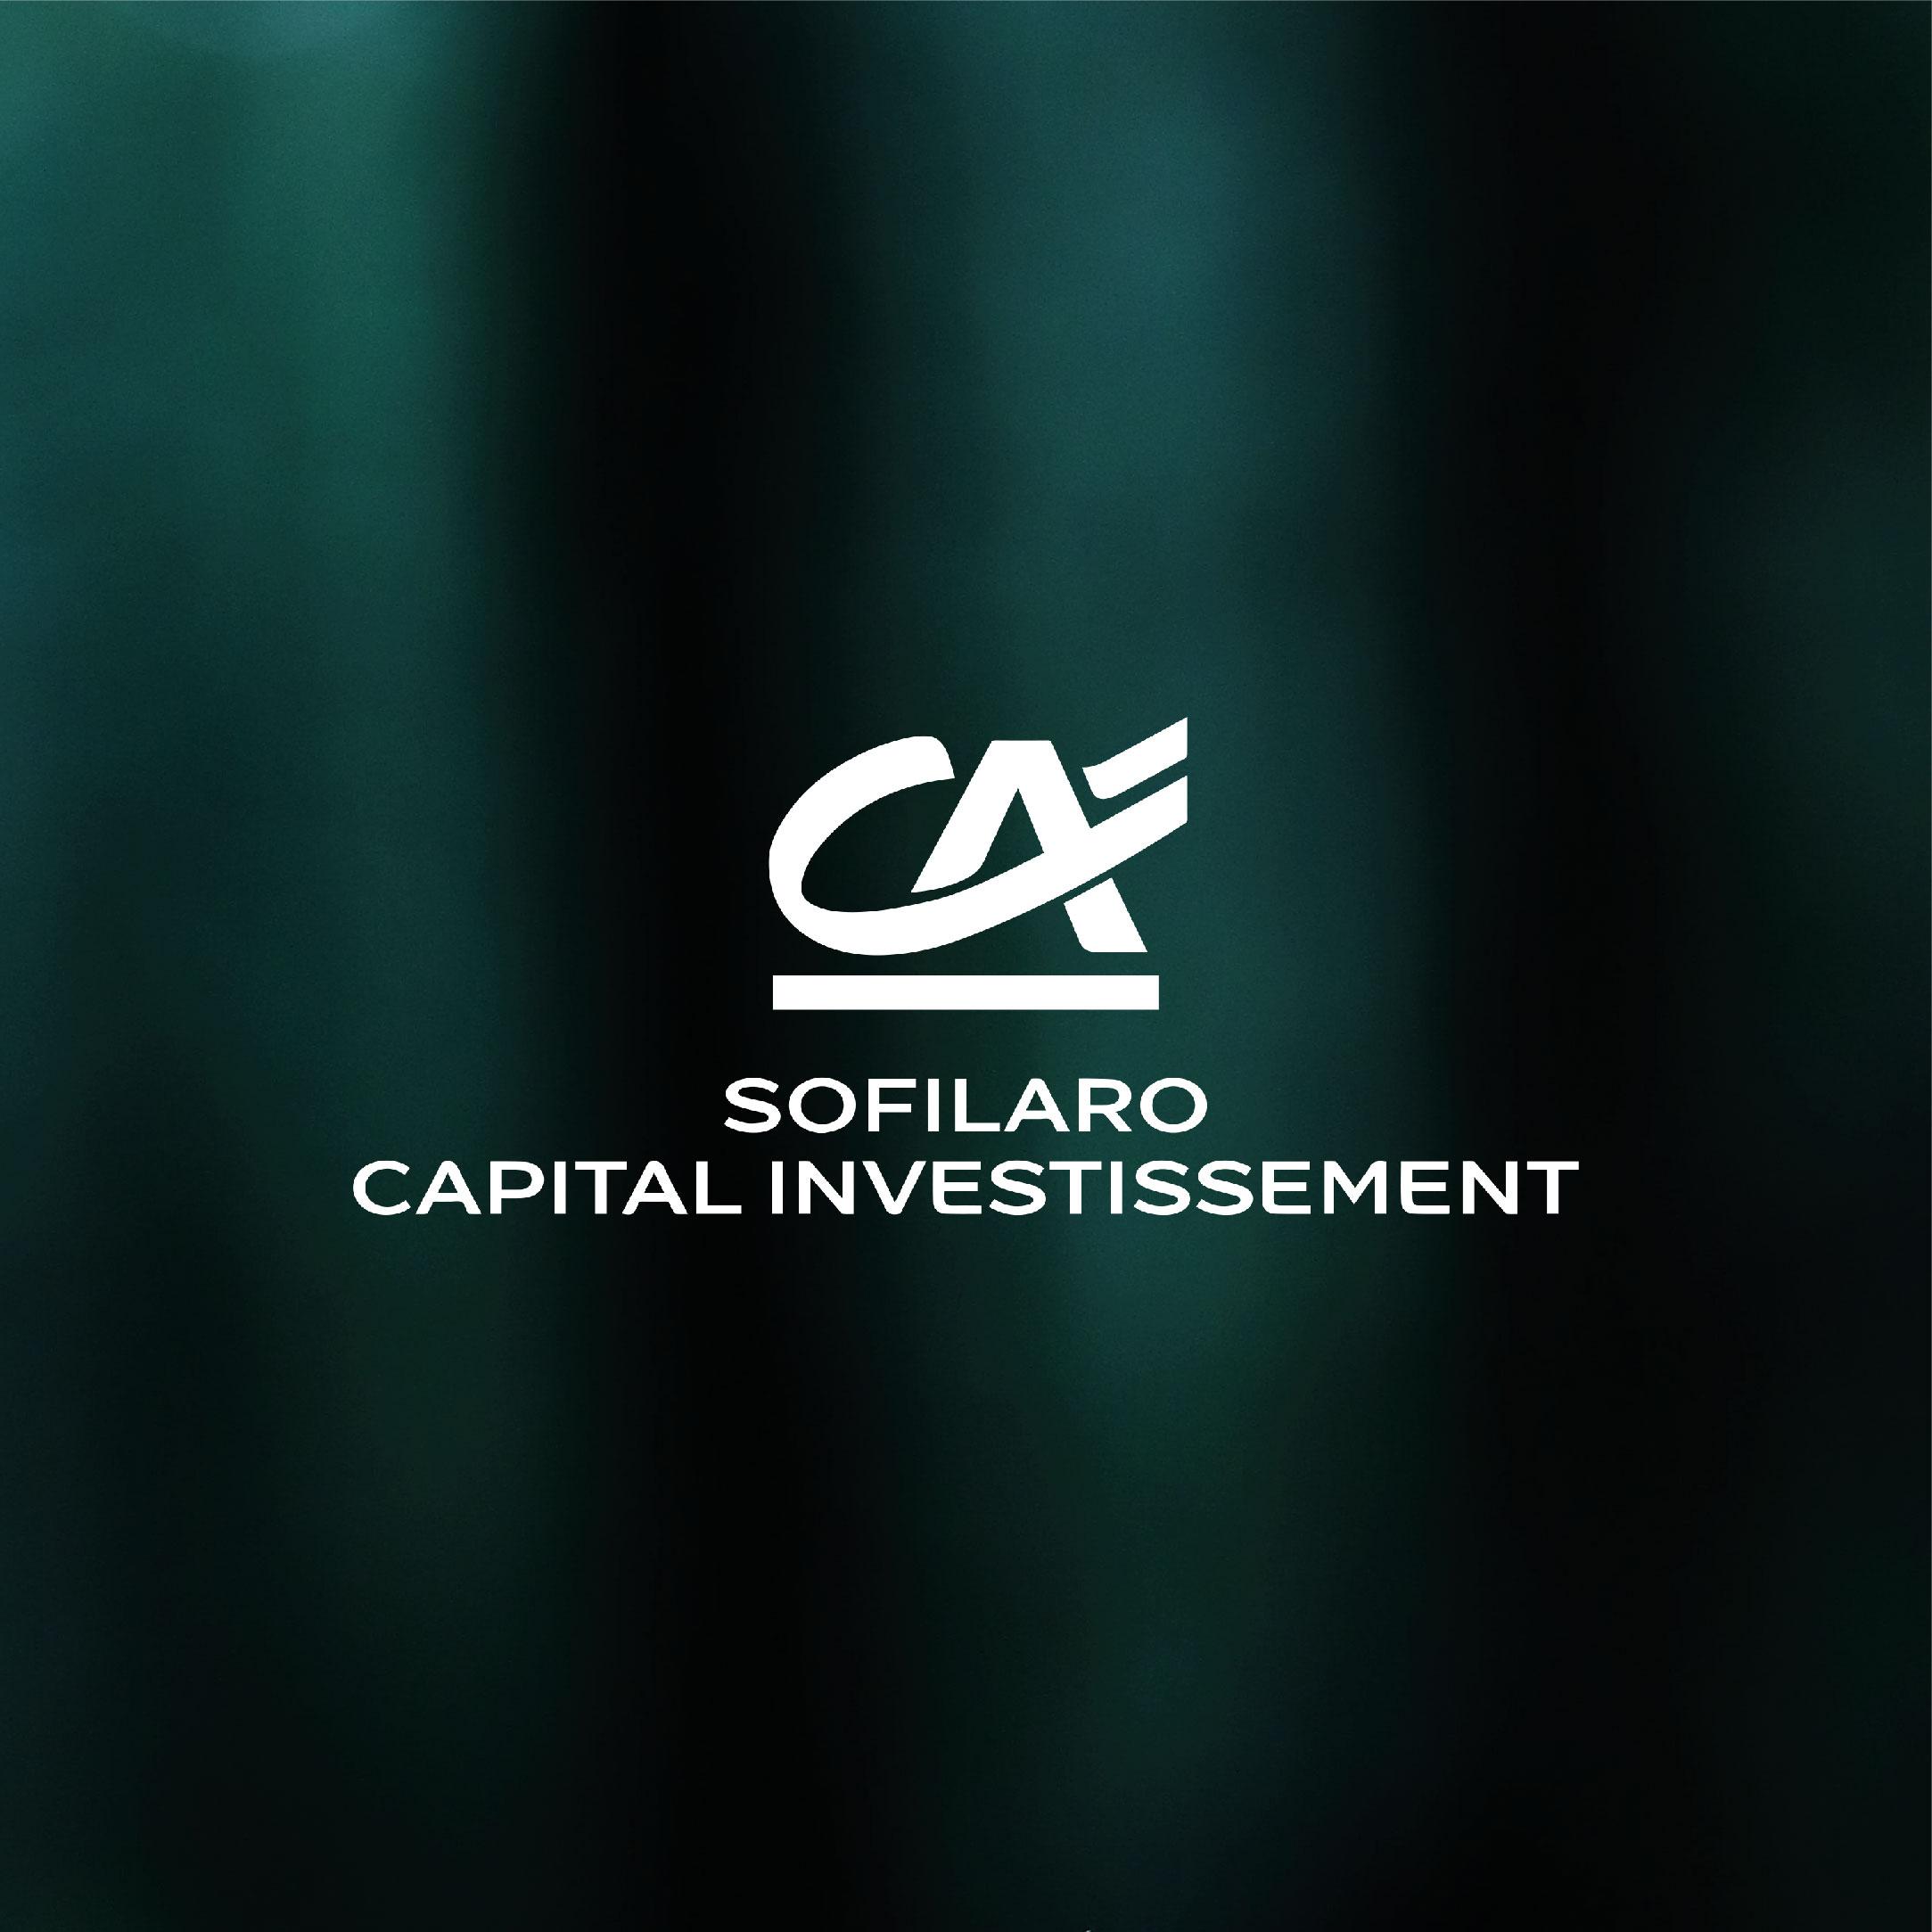 logo sofilaro capital investissement credit agricole